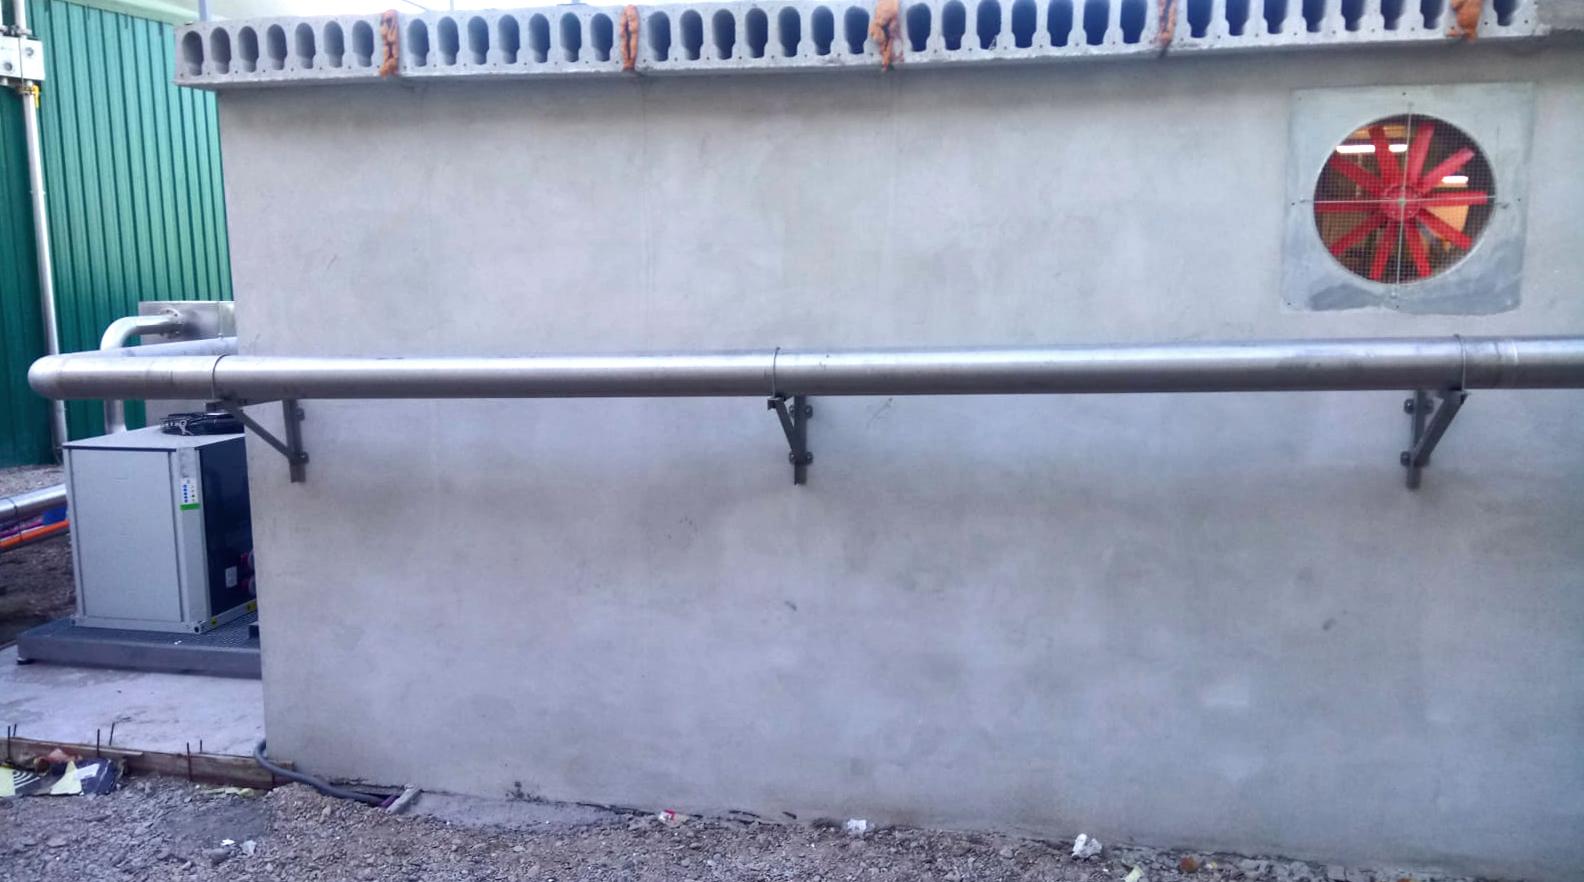 ECOBIOGAS GESTCOMPOST Biogas INDEREN ECOBIOGAS-Pina de Ebro-Zaragoza-INDEREN02